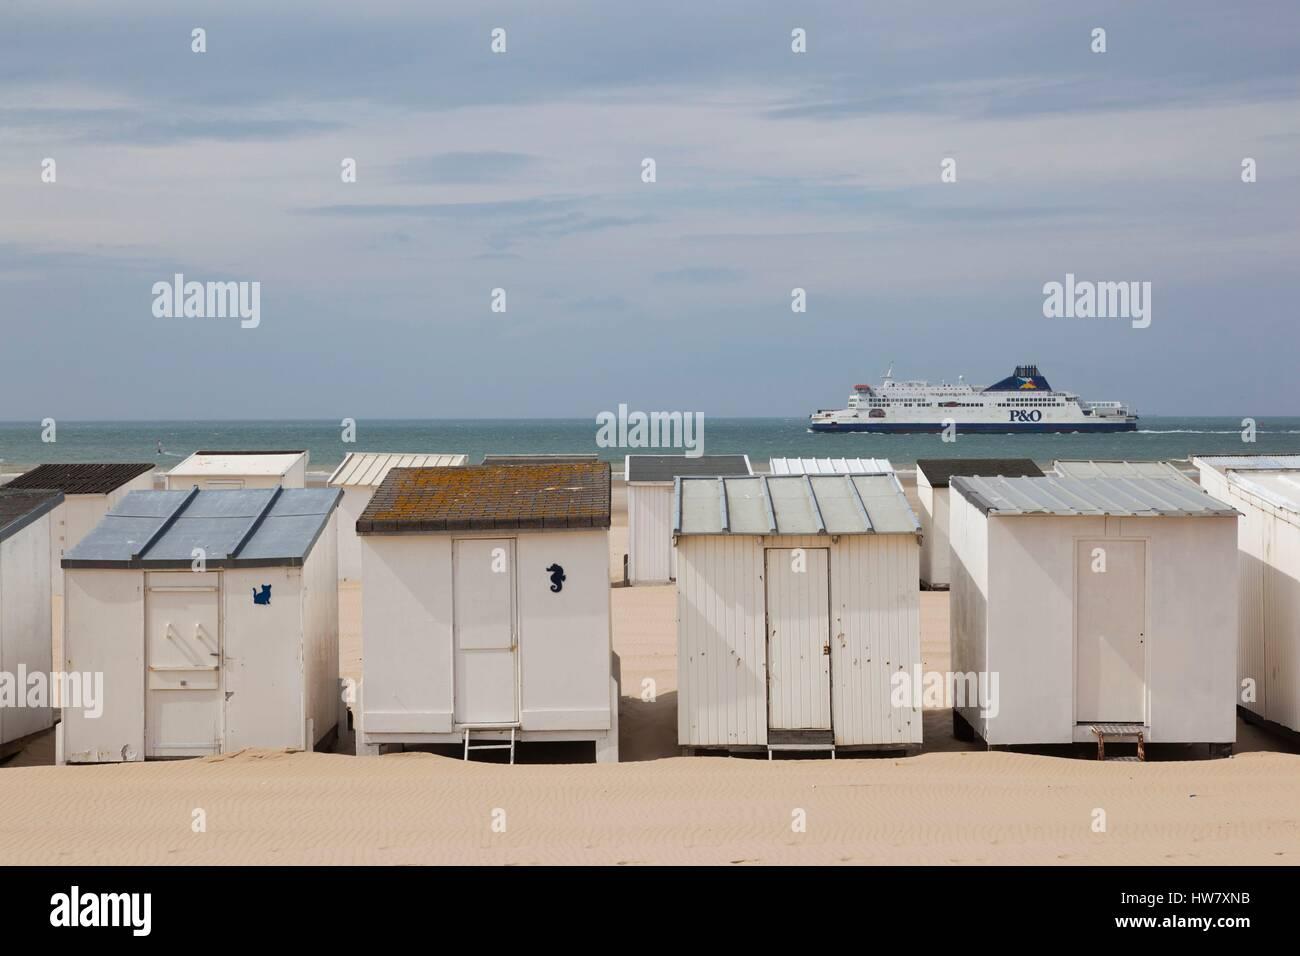 France, Pas de Calais, Bleriot Plage, beach huts along English Channel with ferry Stock Photo